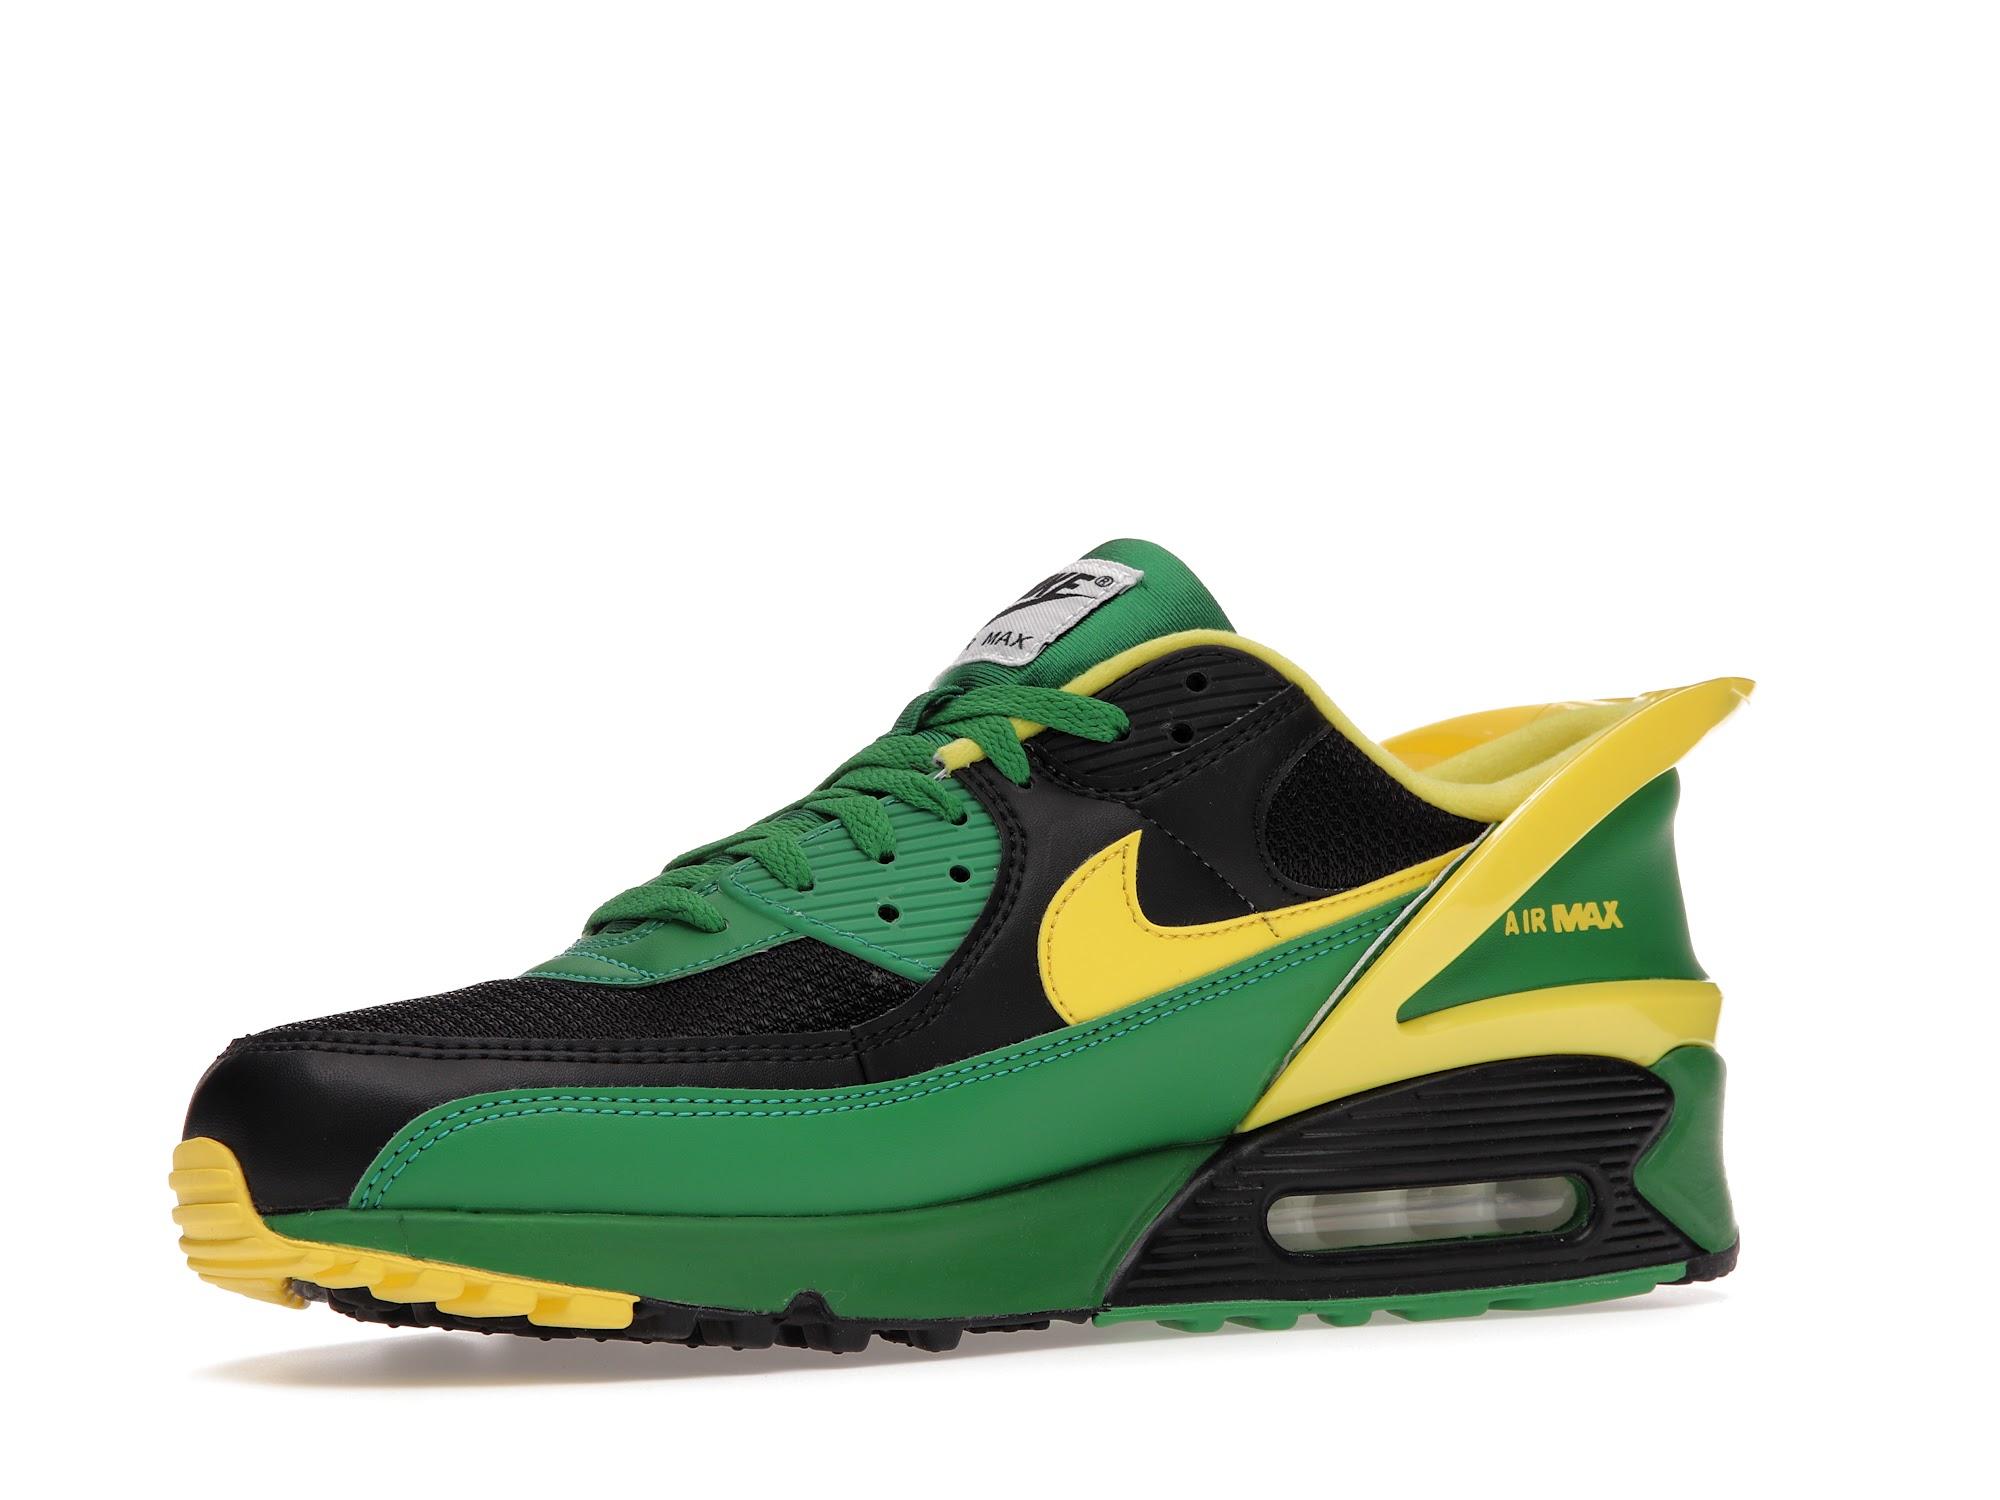 Nike Air Max 90 Flyease Oregon